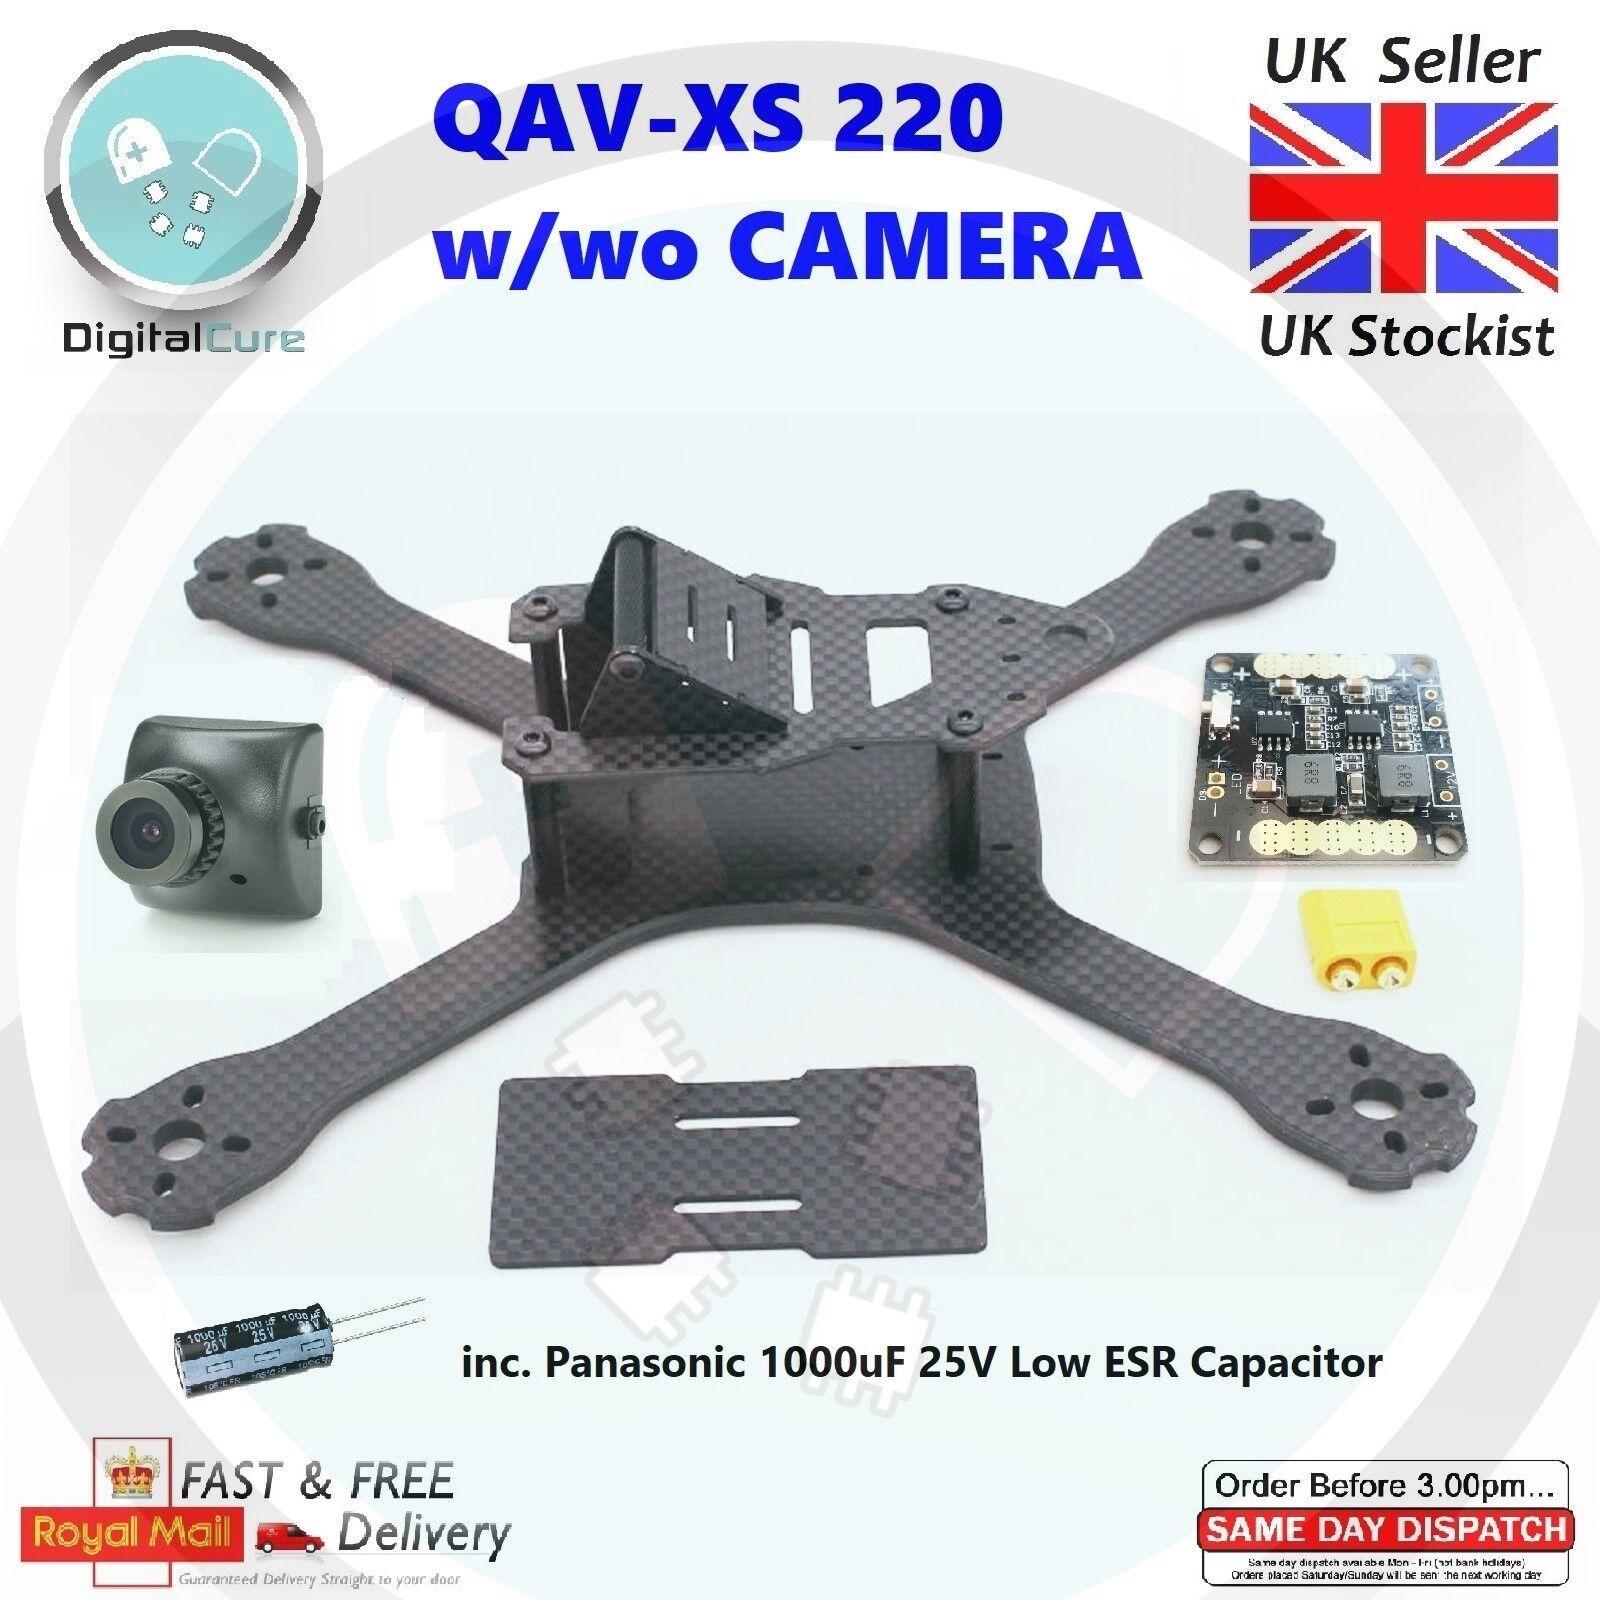 QAV-XS 220mm Carbon Fiber Racing Quadcopter Frame 4mm ARMS w wo Camera - QAV-R